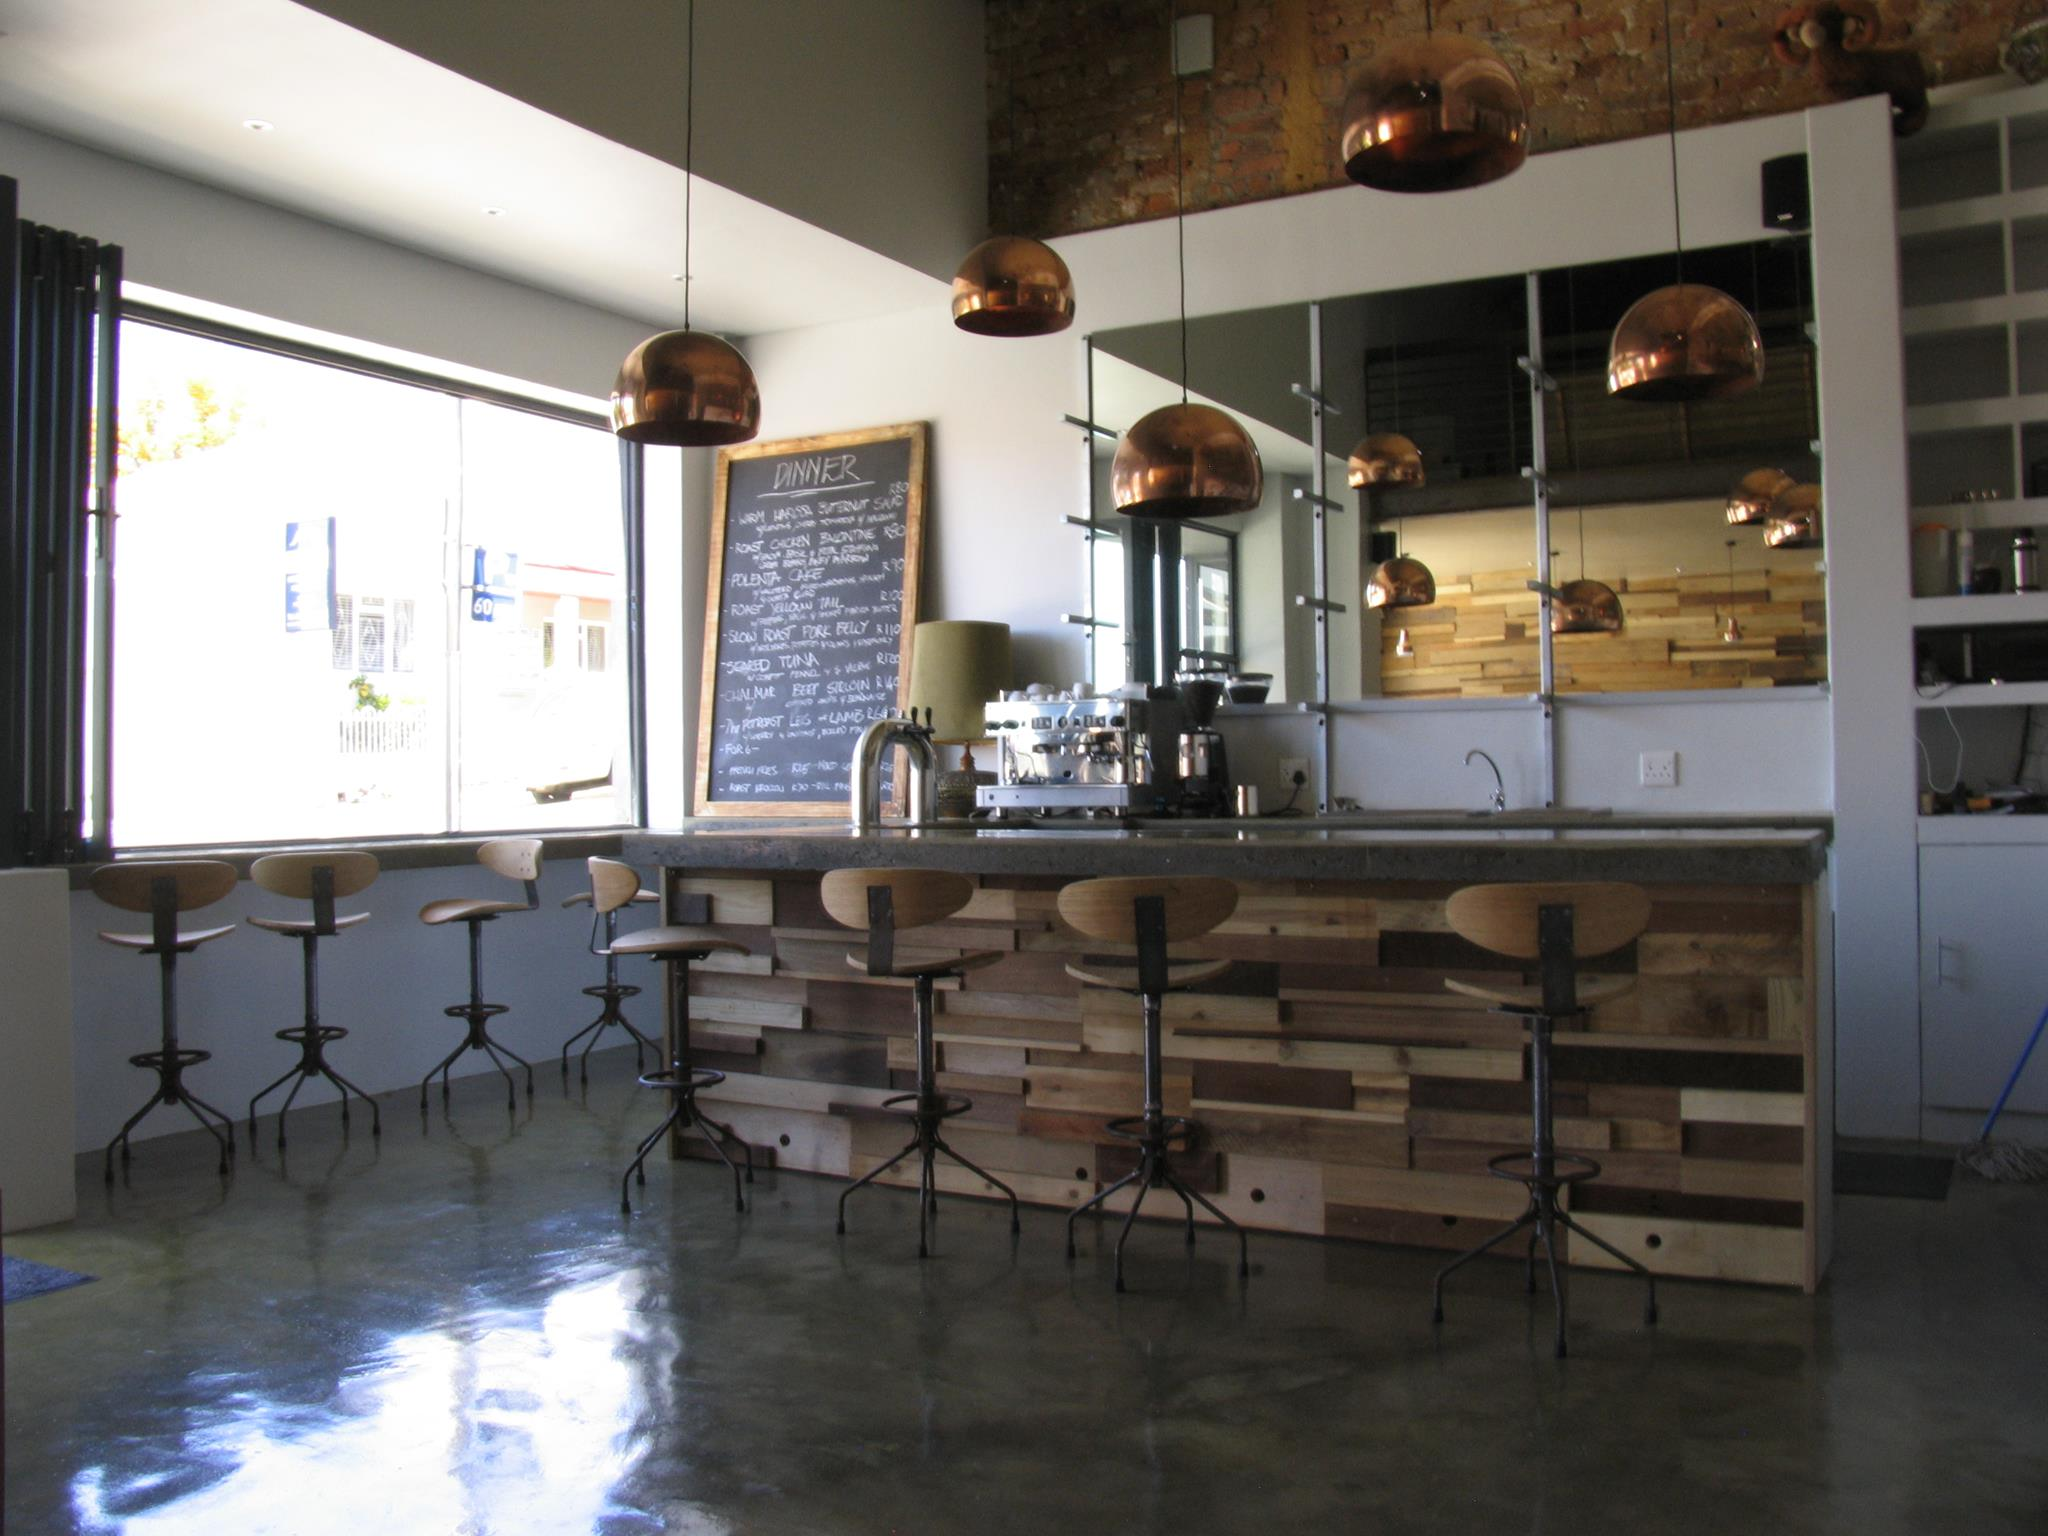 black sheep - restaurant in cape town - eatout